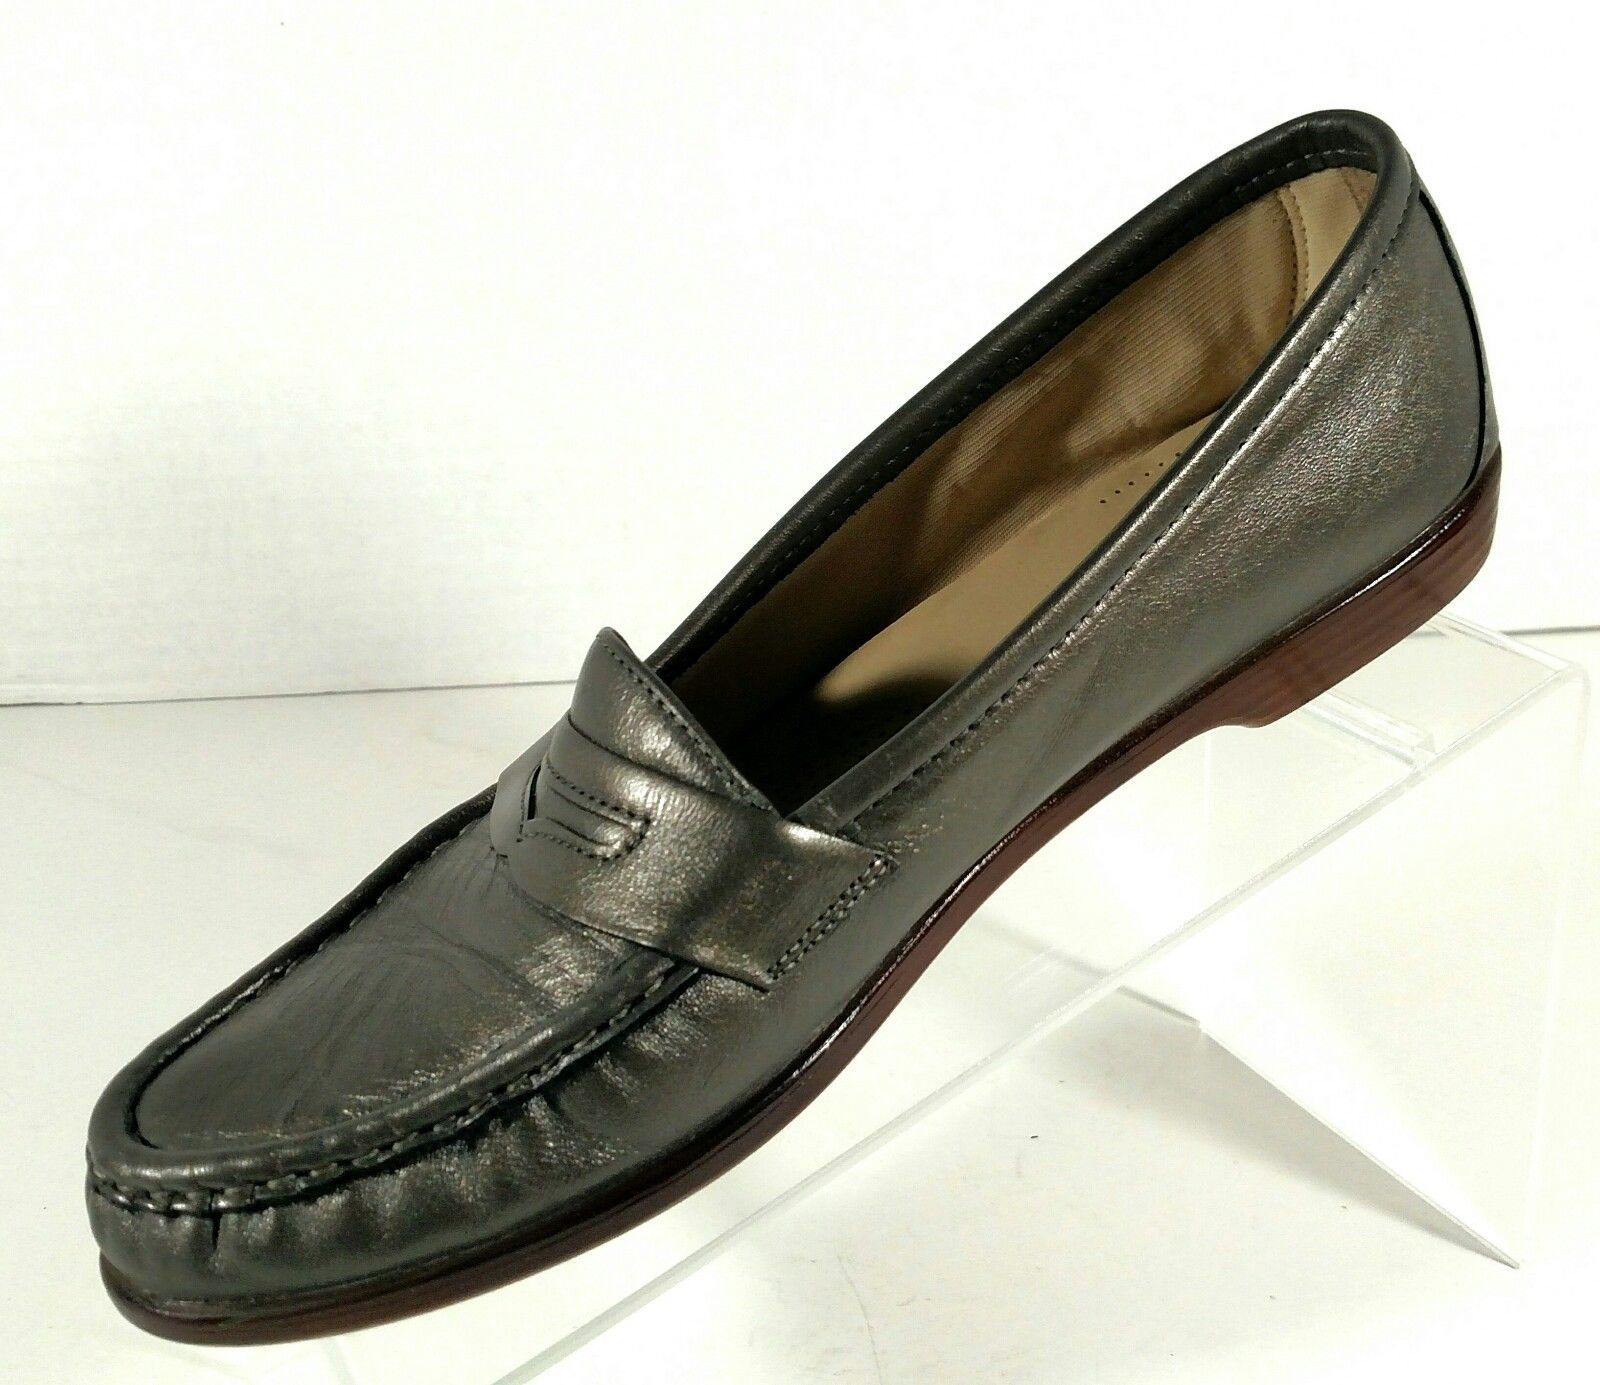 031114af160 SAS Tripad Comfort Shoes Penny Loafer Slip On Grey Leather Women s Size 10